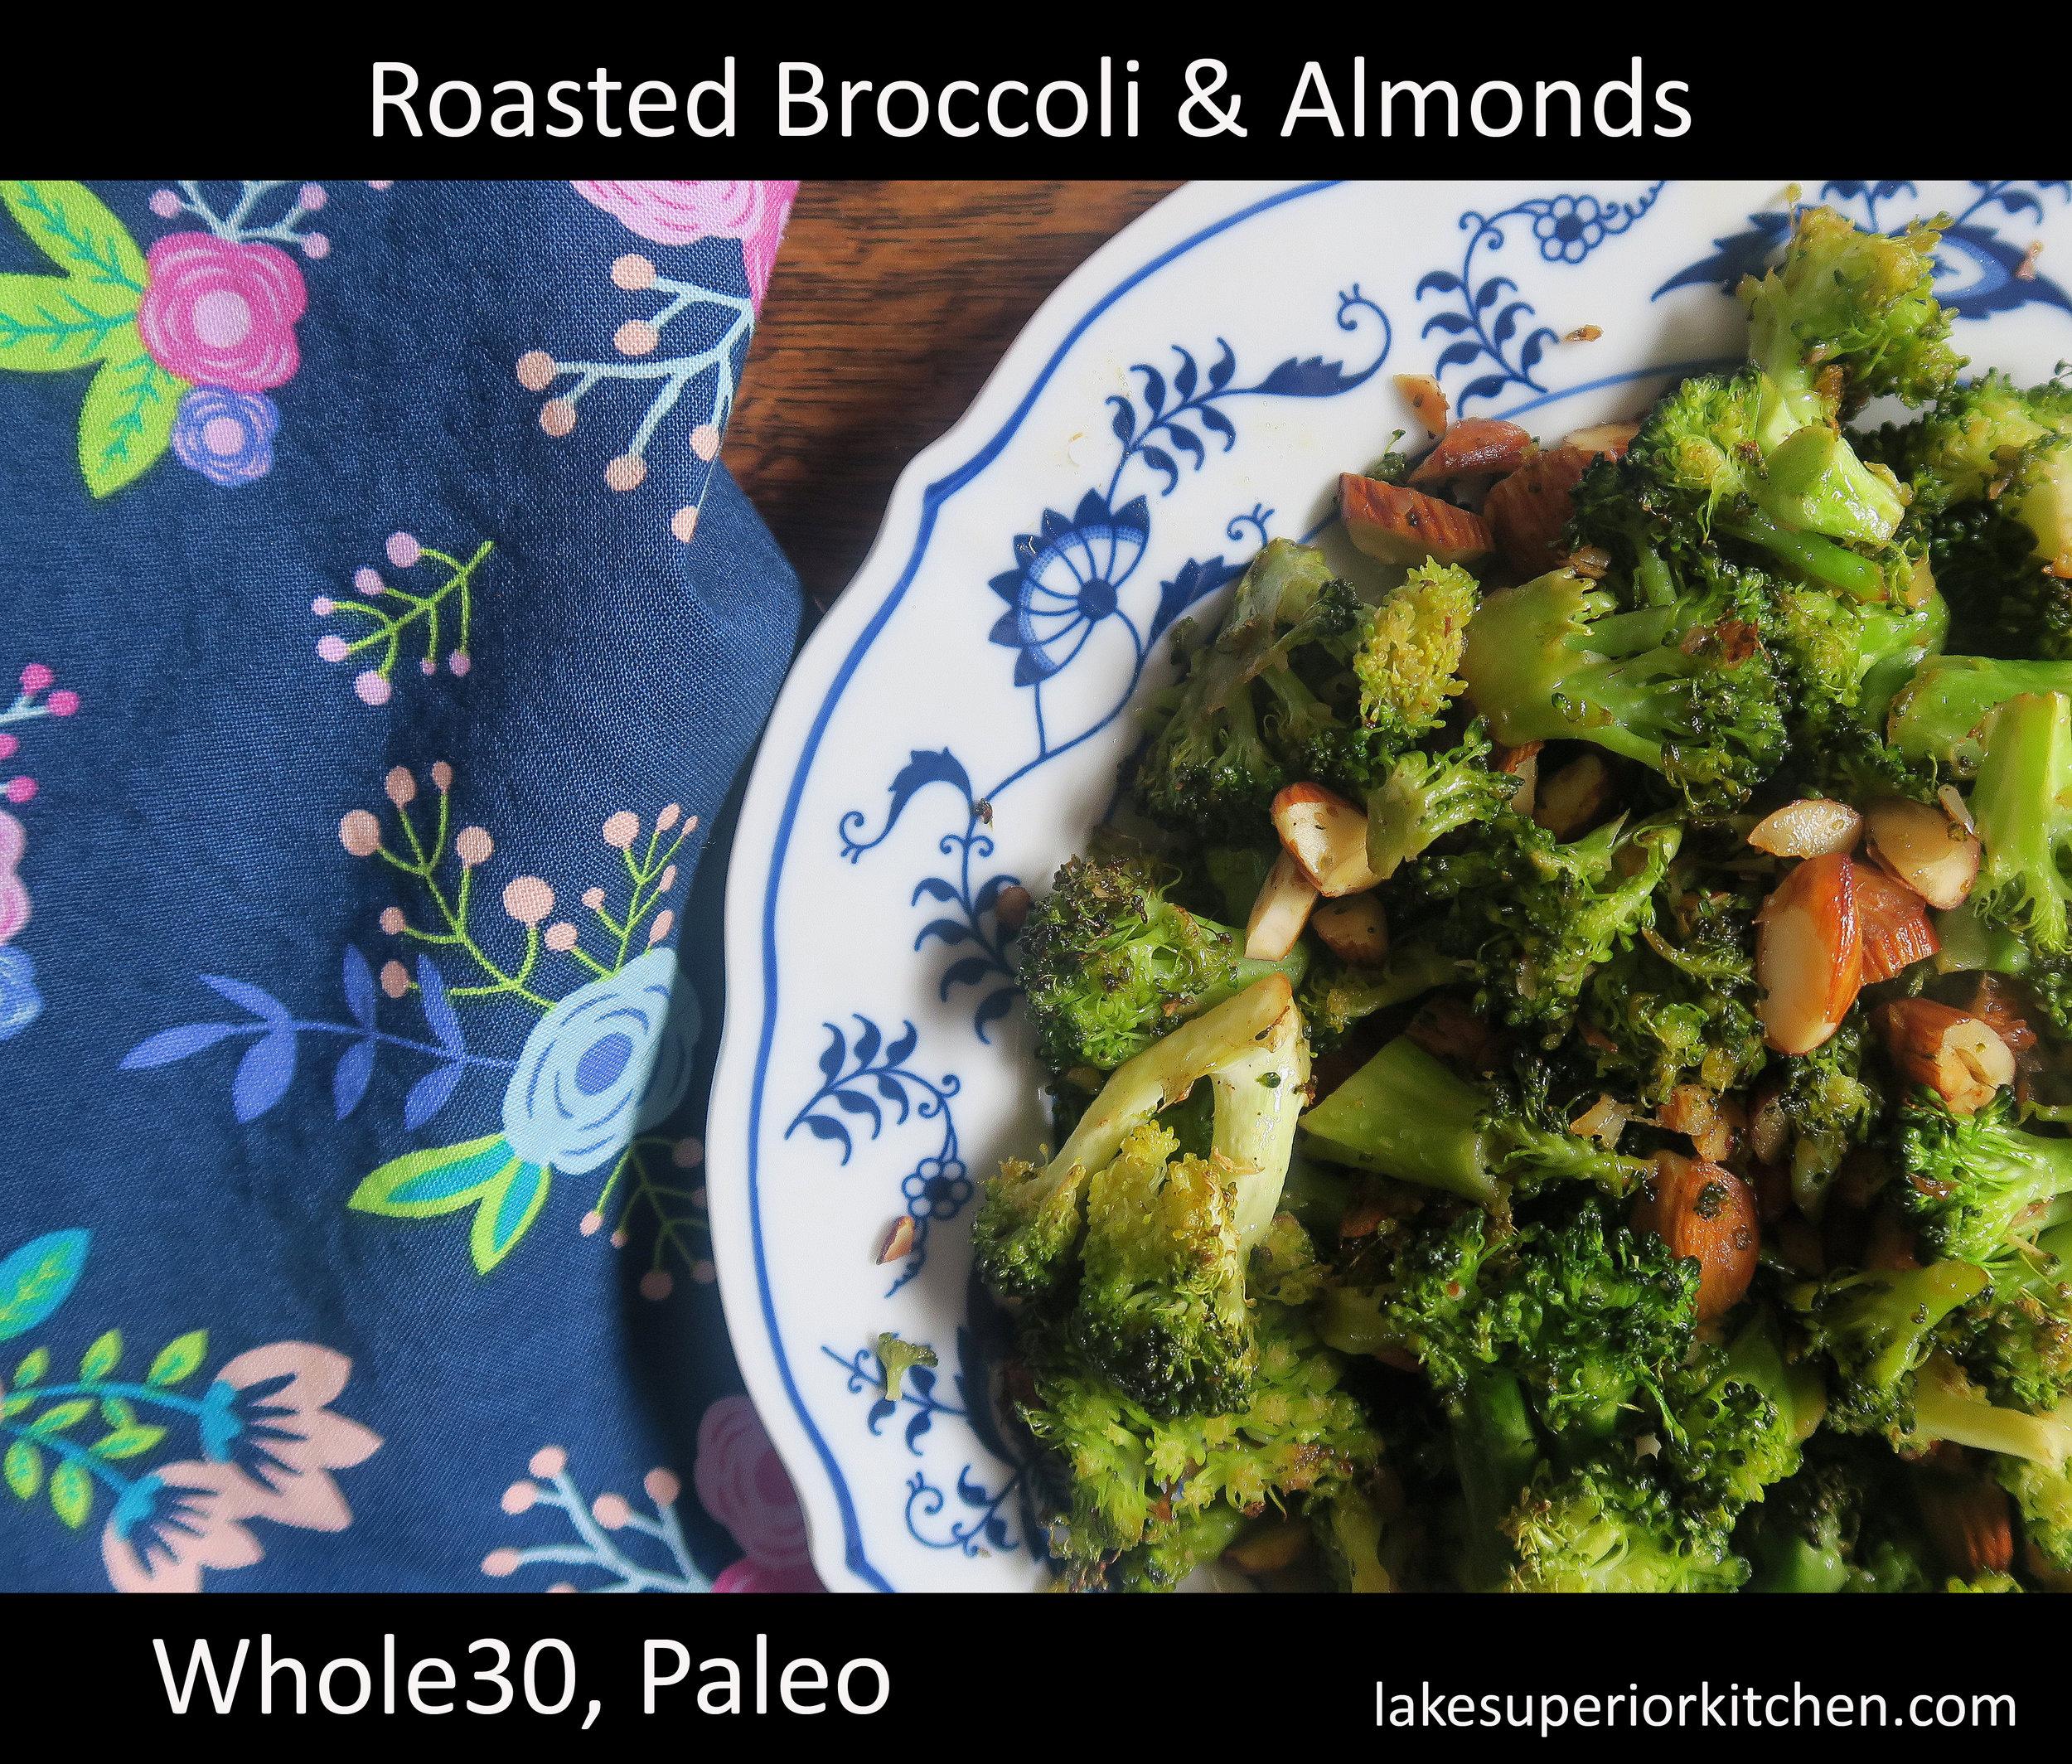 paleo recipe, whole30 recipe, broccoli, almonds, whole30, healthy side dish, vegetable, grain free